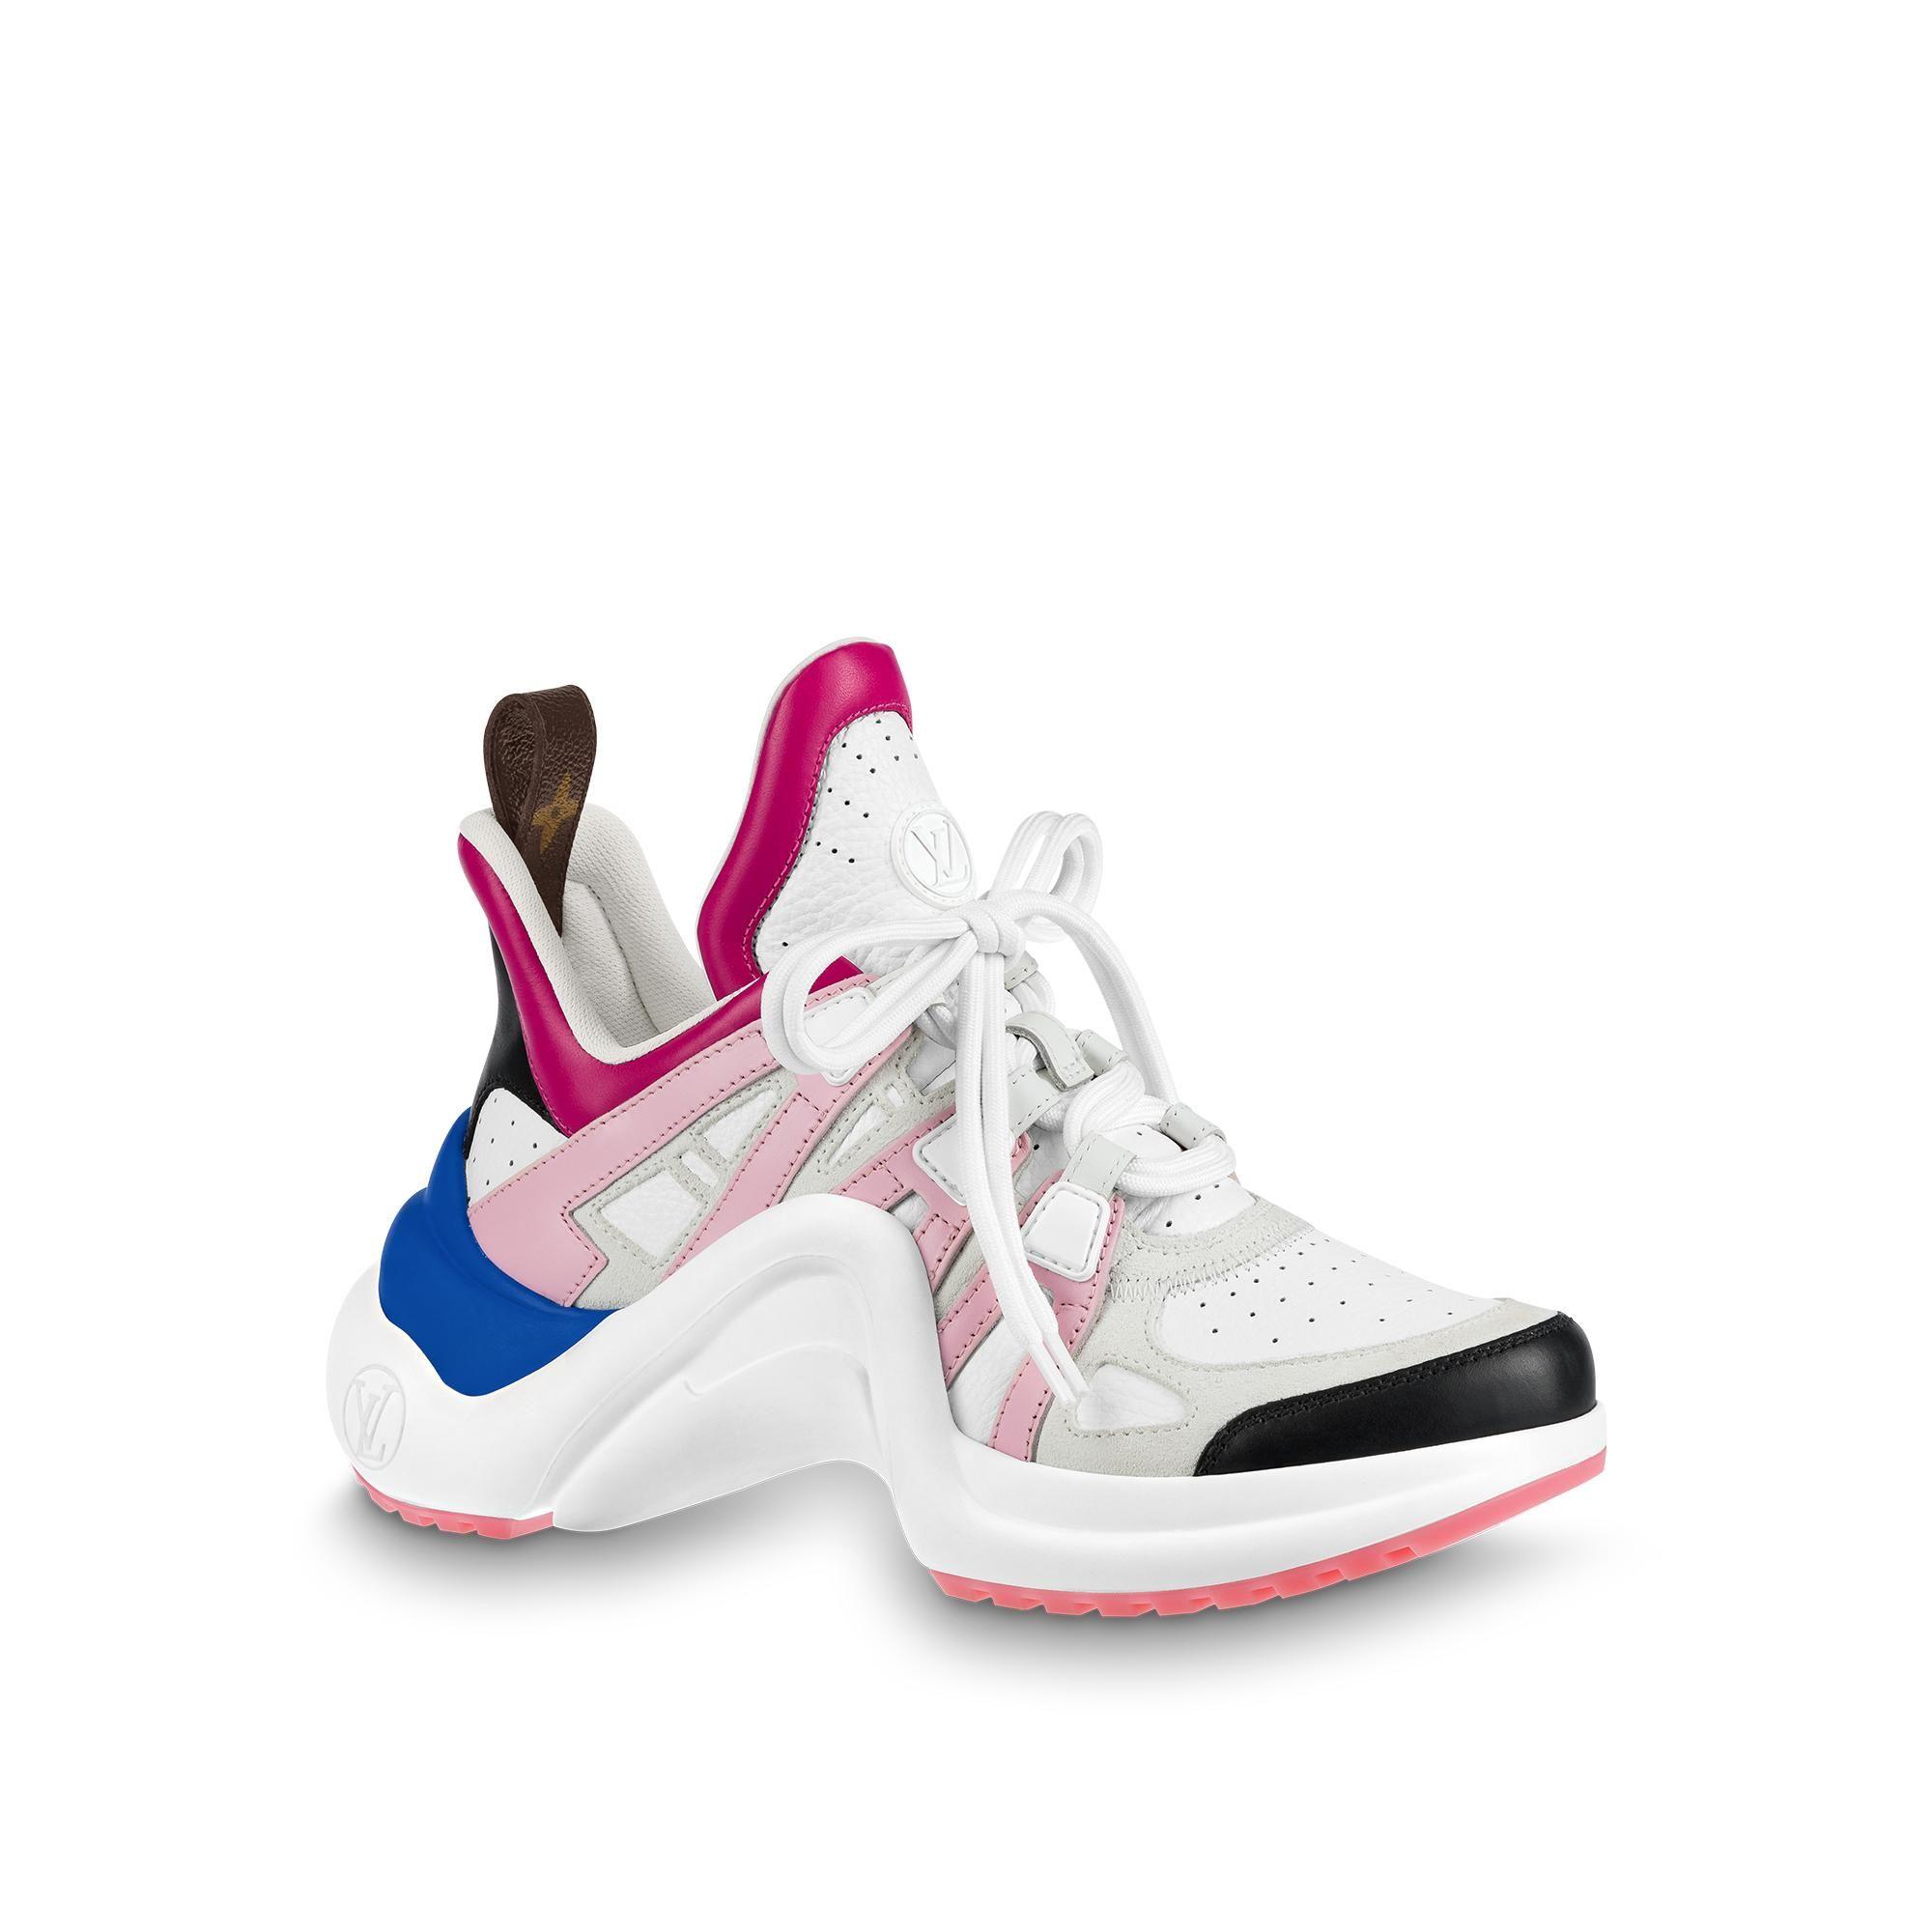 LOUIS VUITTON® LV Archlight Sneaker